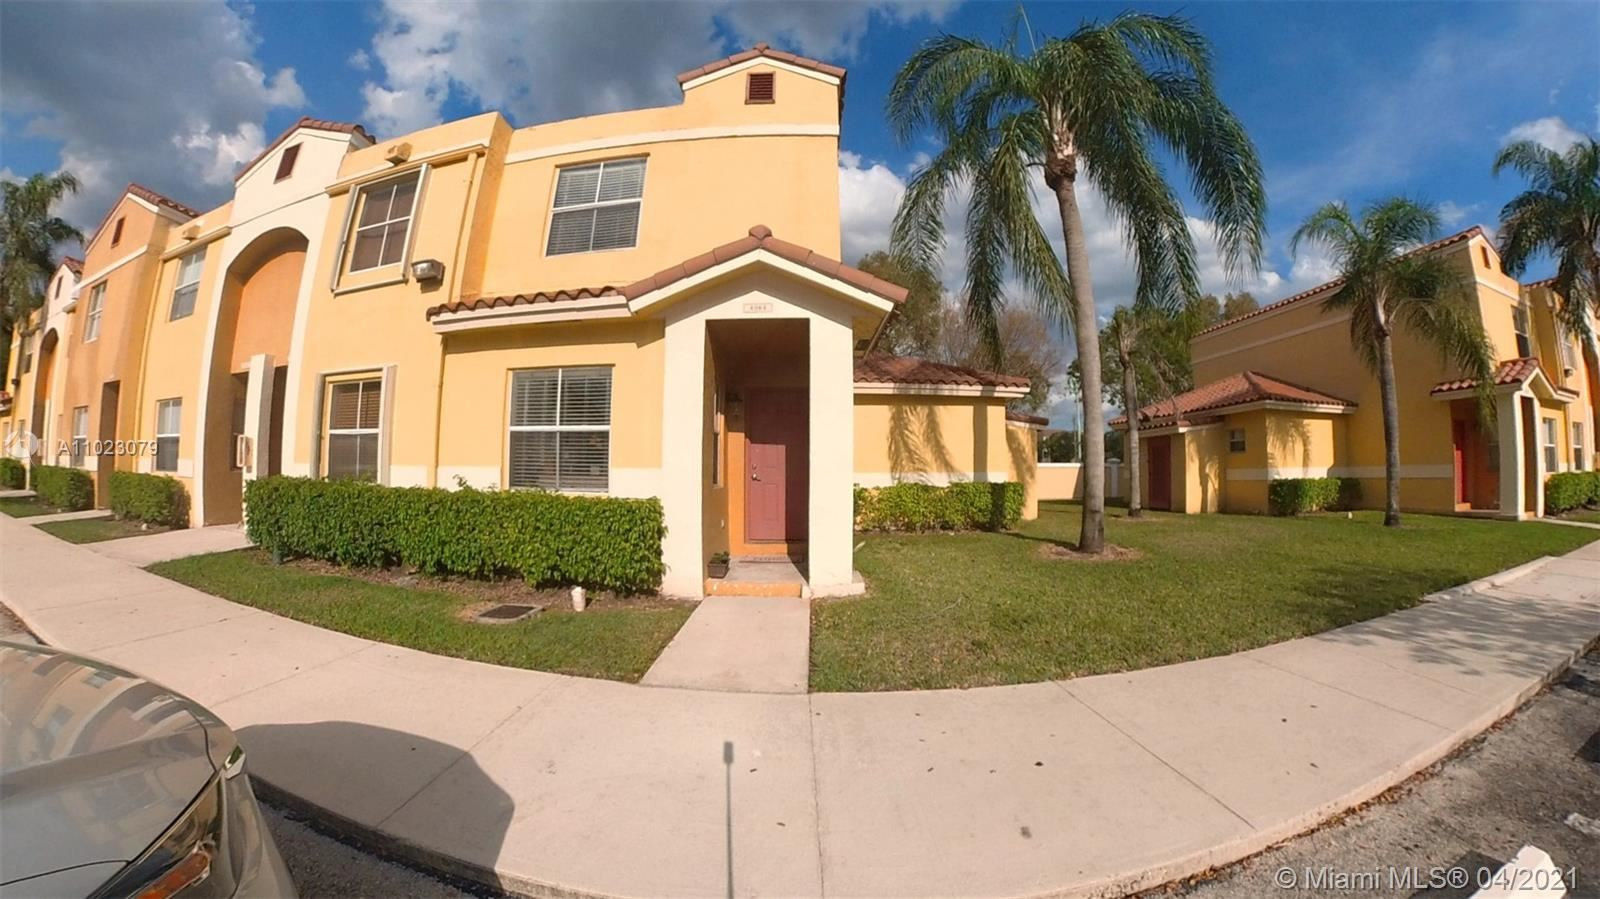 4064 NW 90th Ave #4064, Sunrise, FL 33351 - #: A11023079